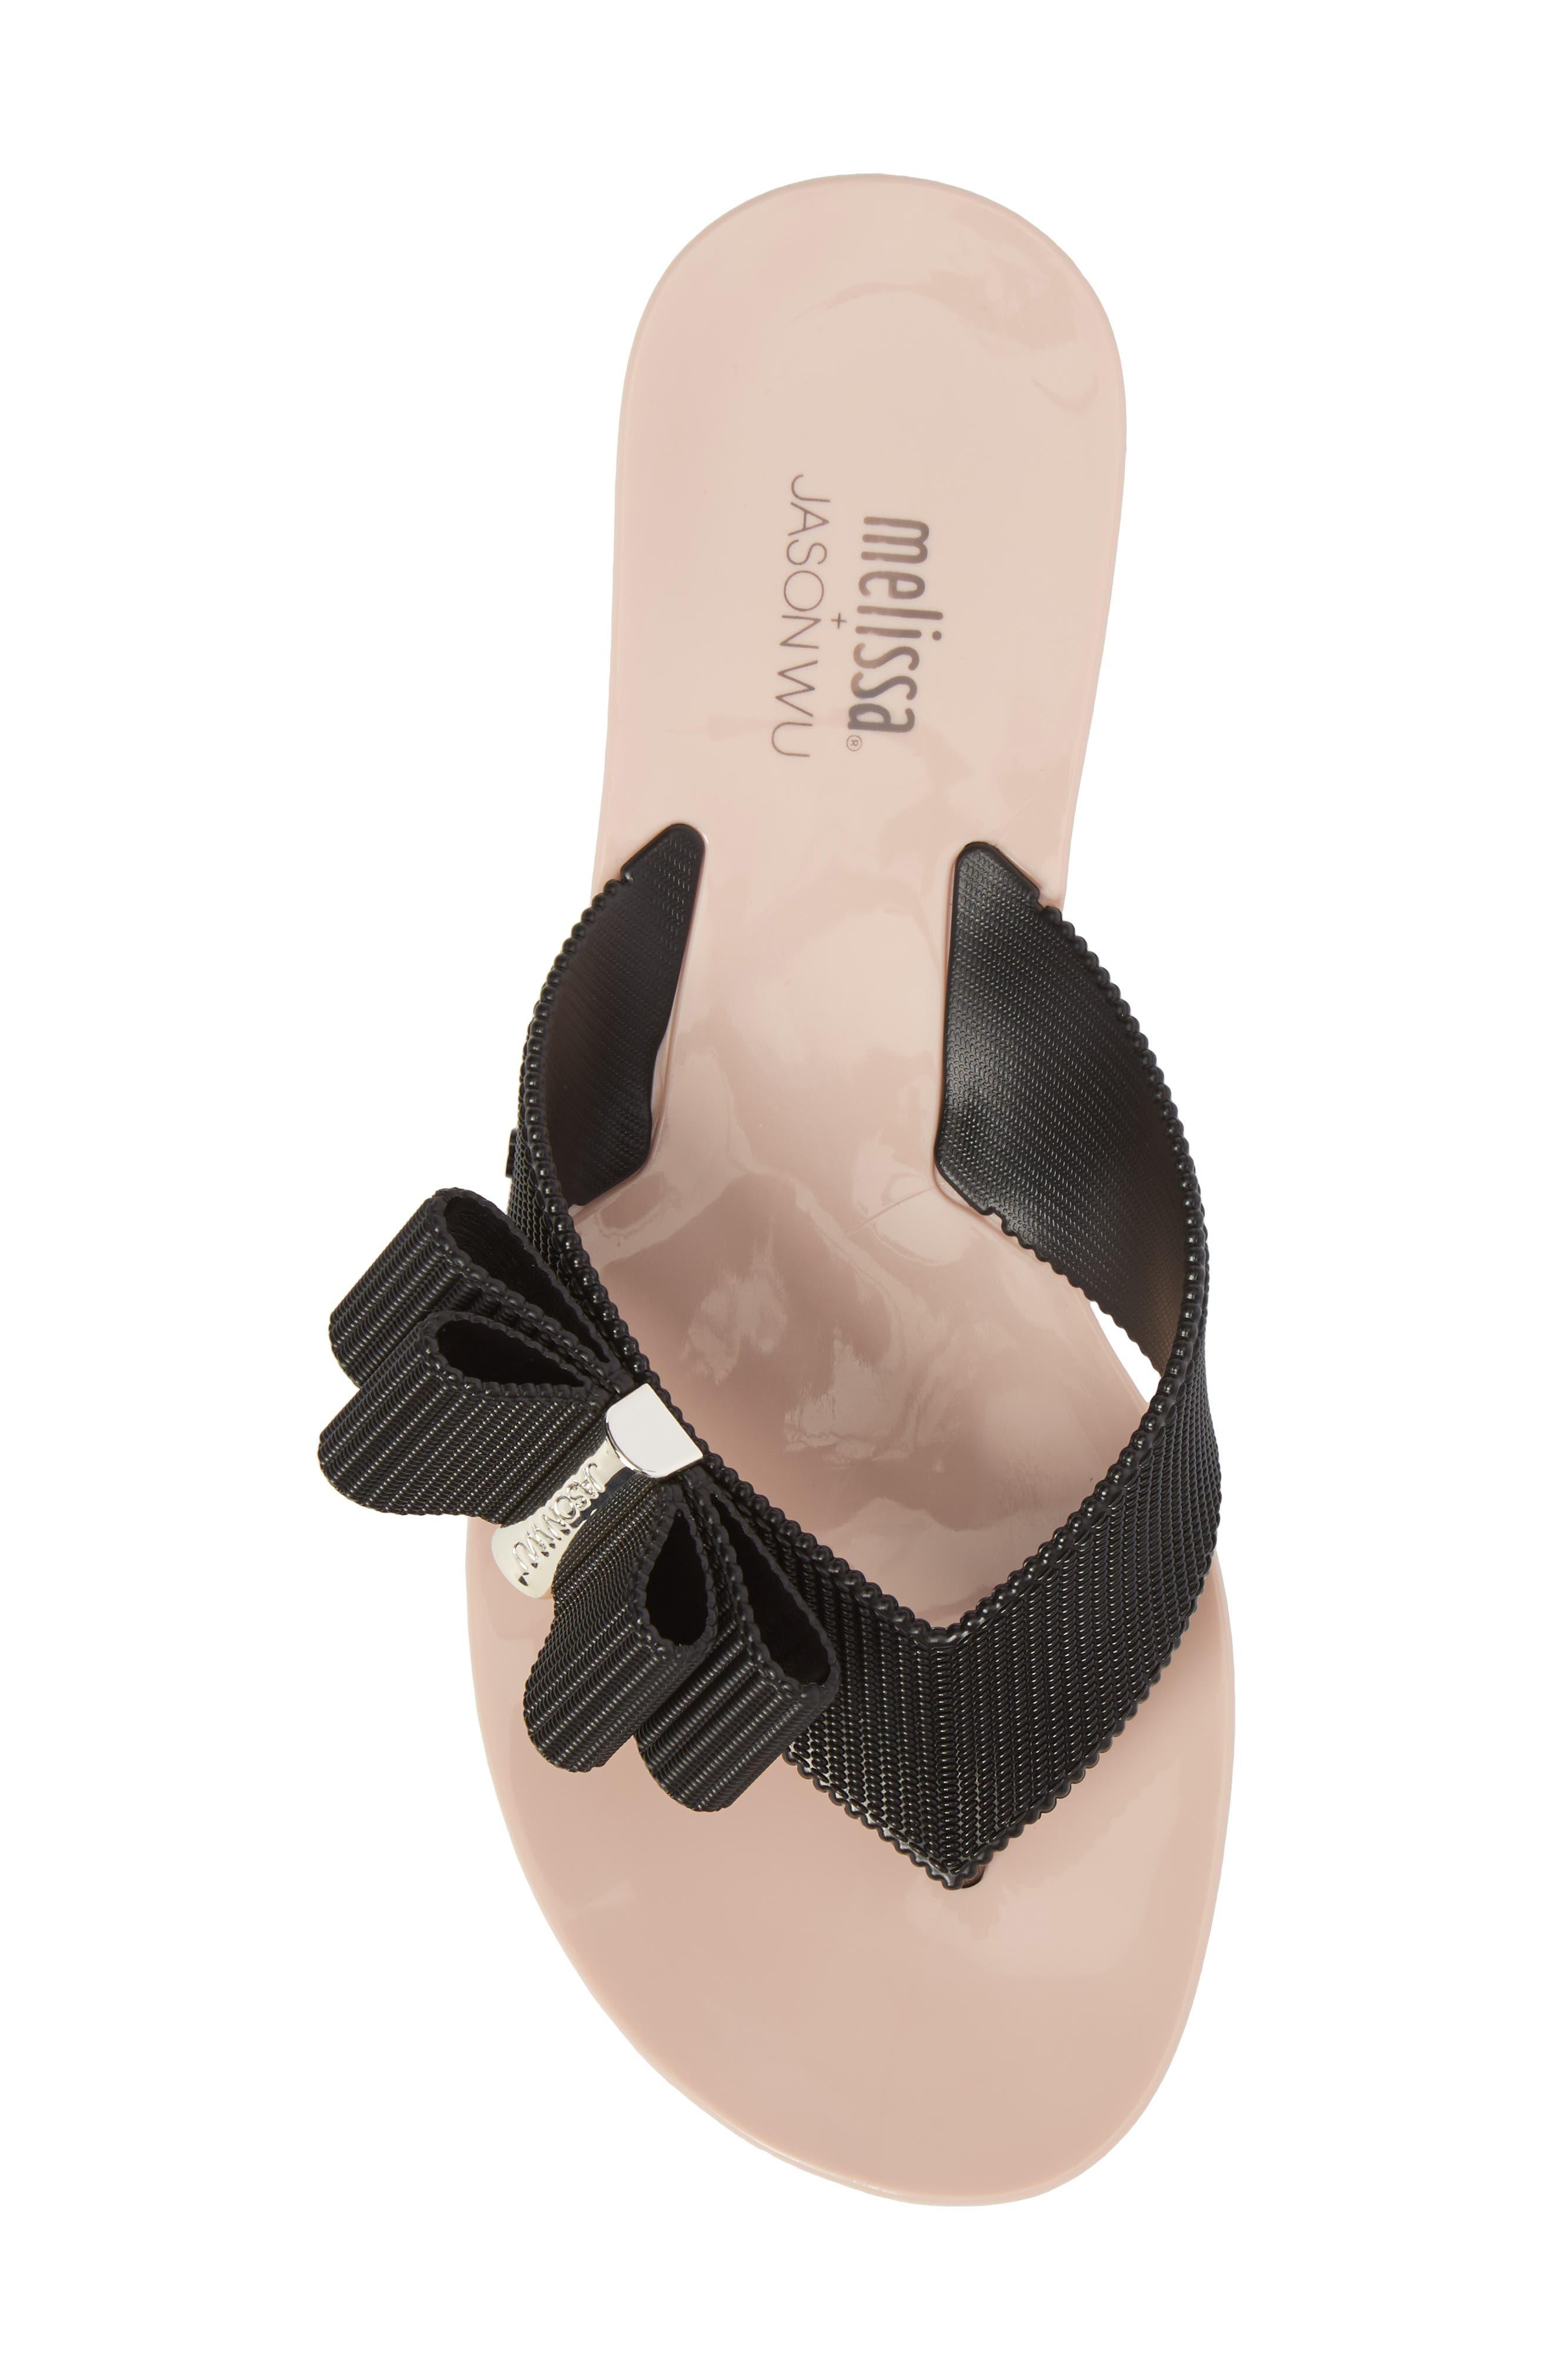 + Jason Wu Girl Bow Flip Flop,                             Alternate thumbnail 5, color,                             Black Pink